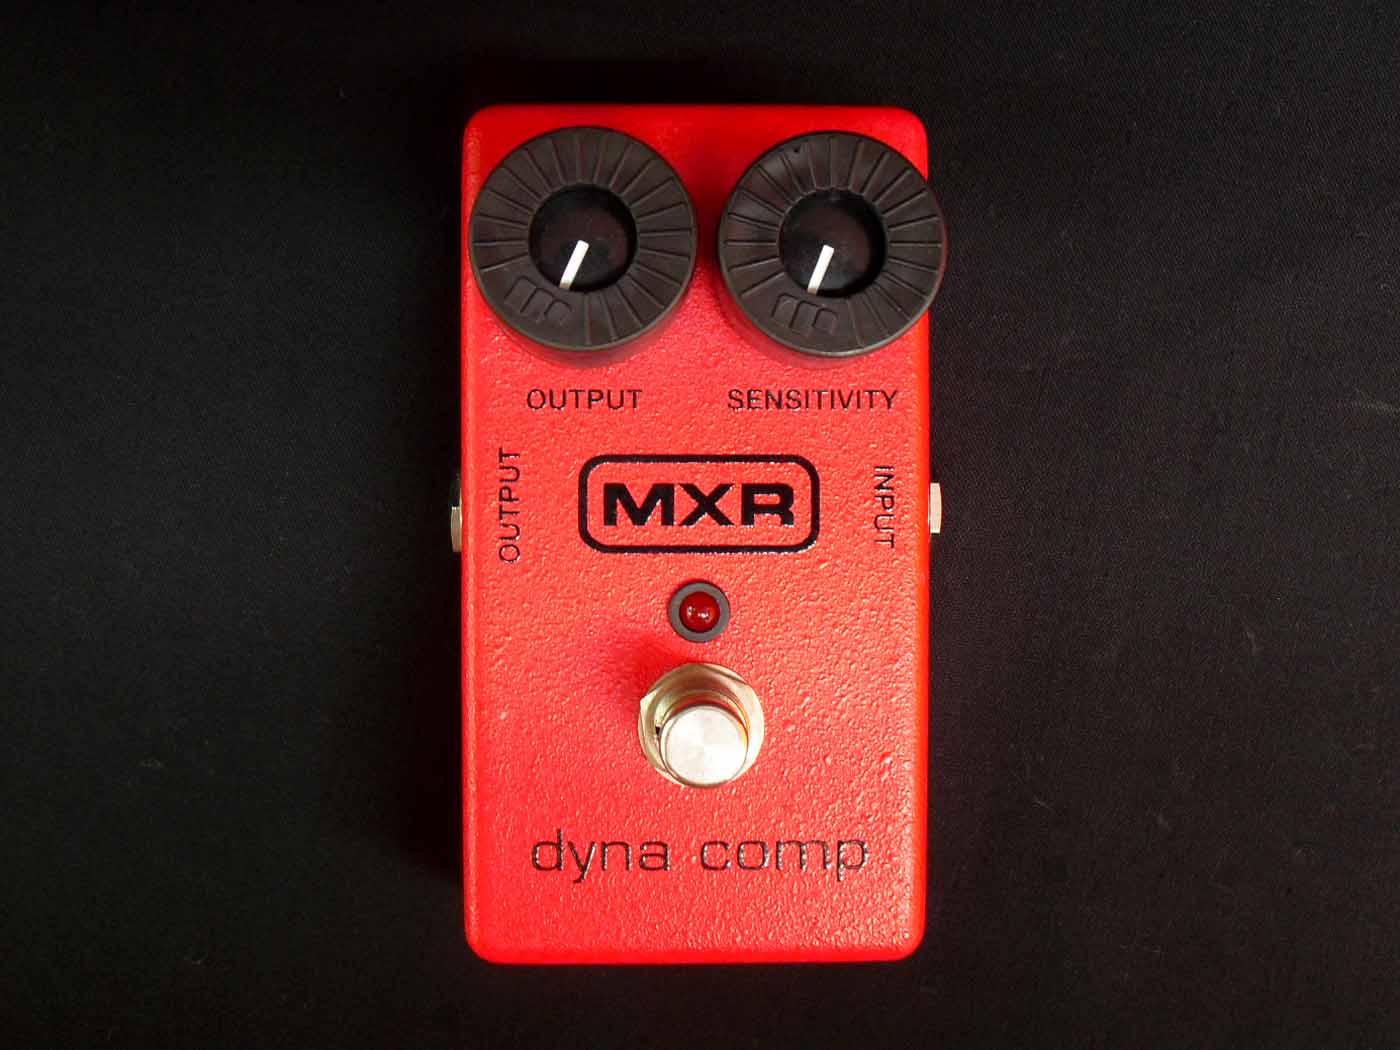 Mxr Dyna Comp Settings : music axe review mxr dyna comp ~ Russianpoet.info Haus und Dekorationen